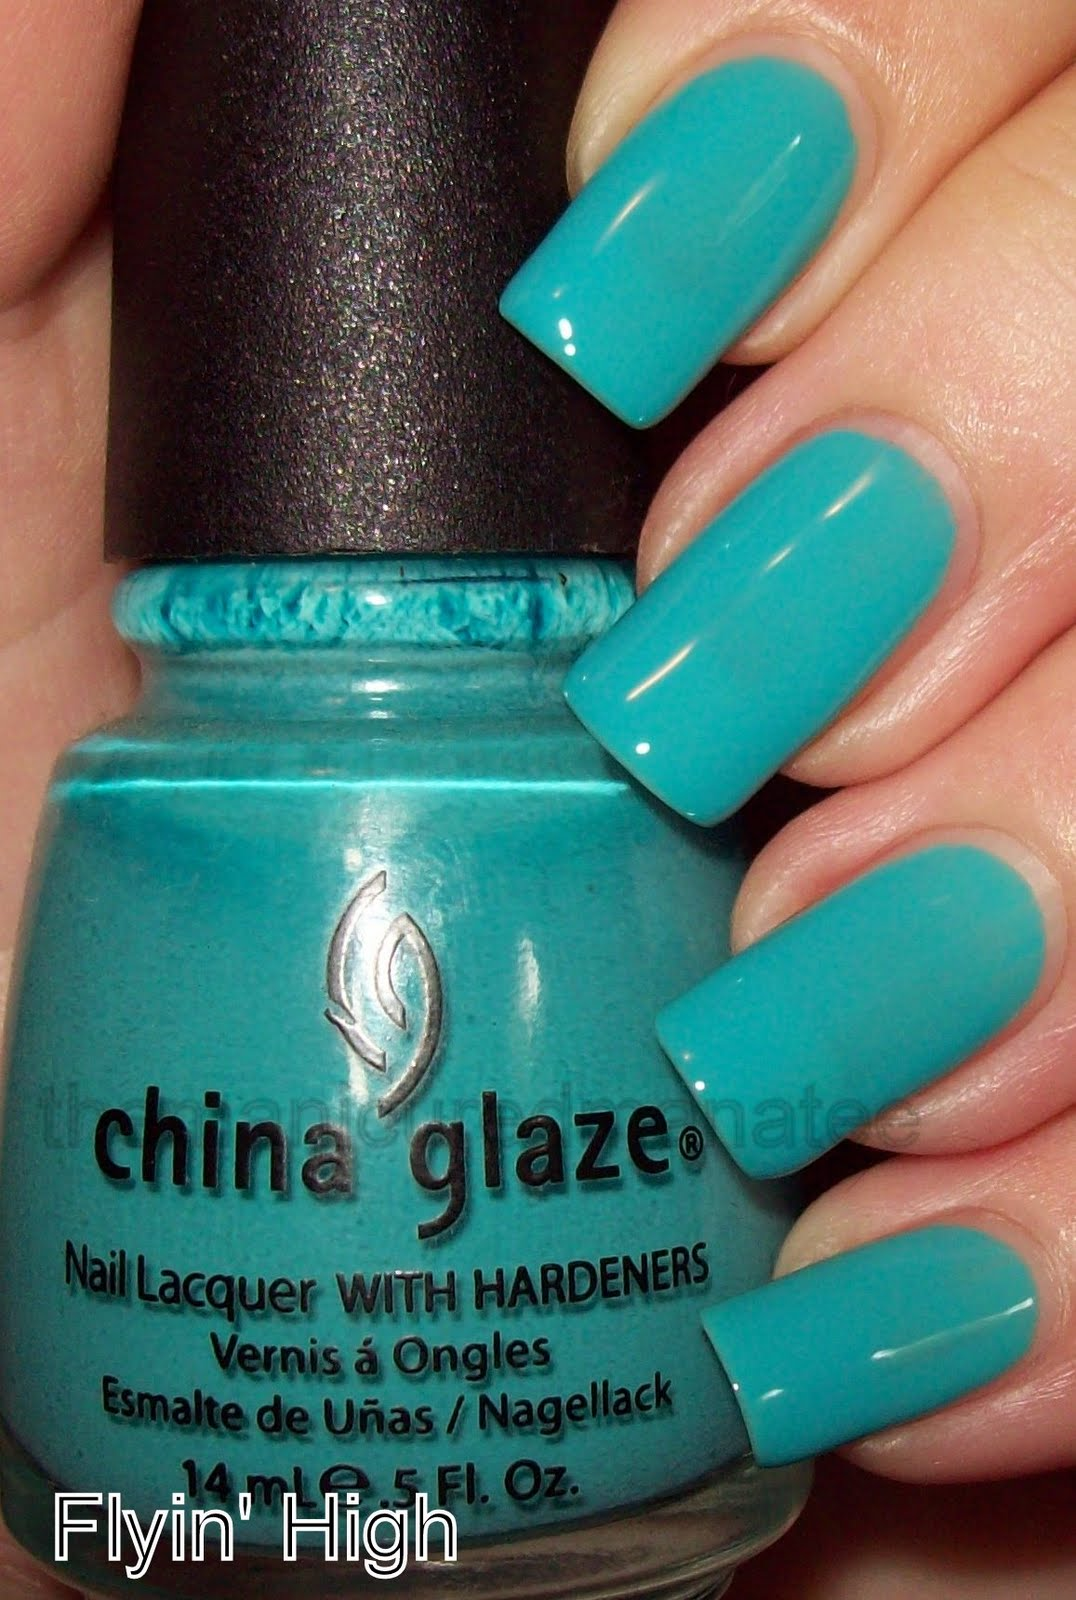 China Glaze Presenta Crakle Glaze: The Manicured Manatee: China Glaze Up & Away